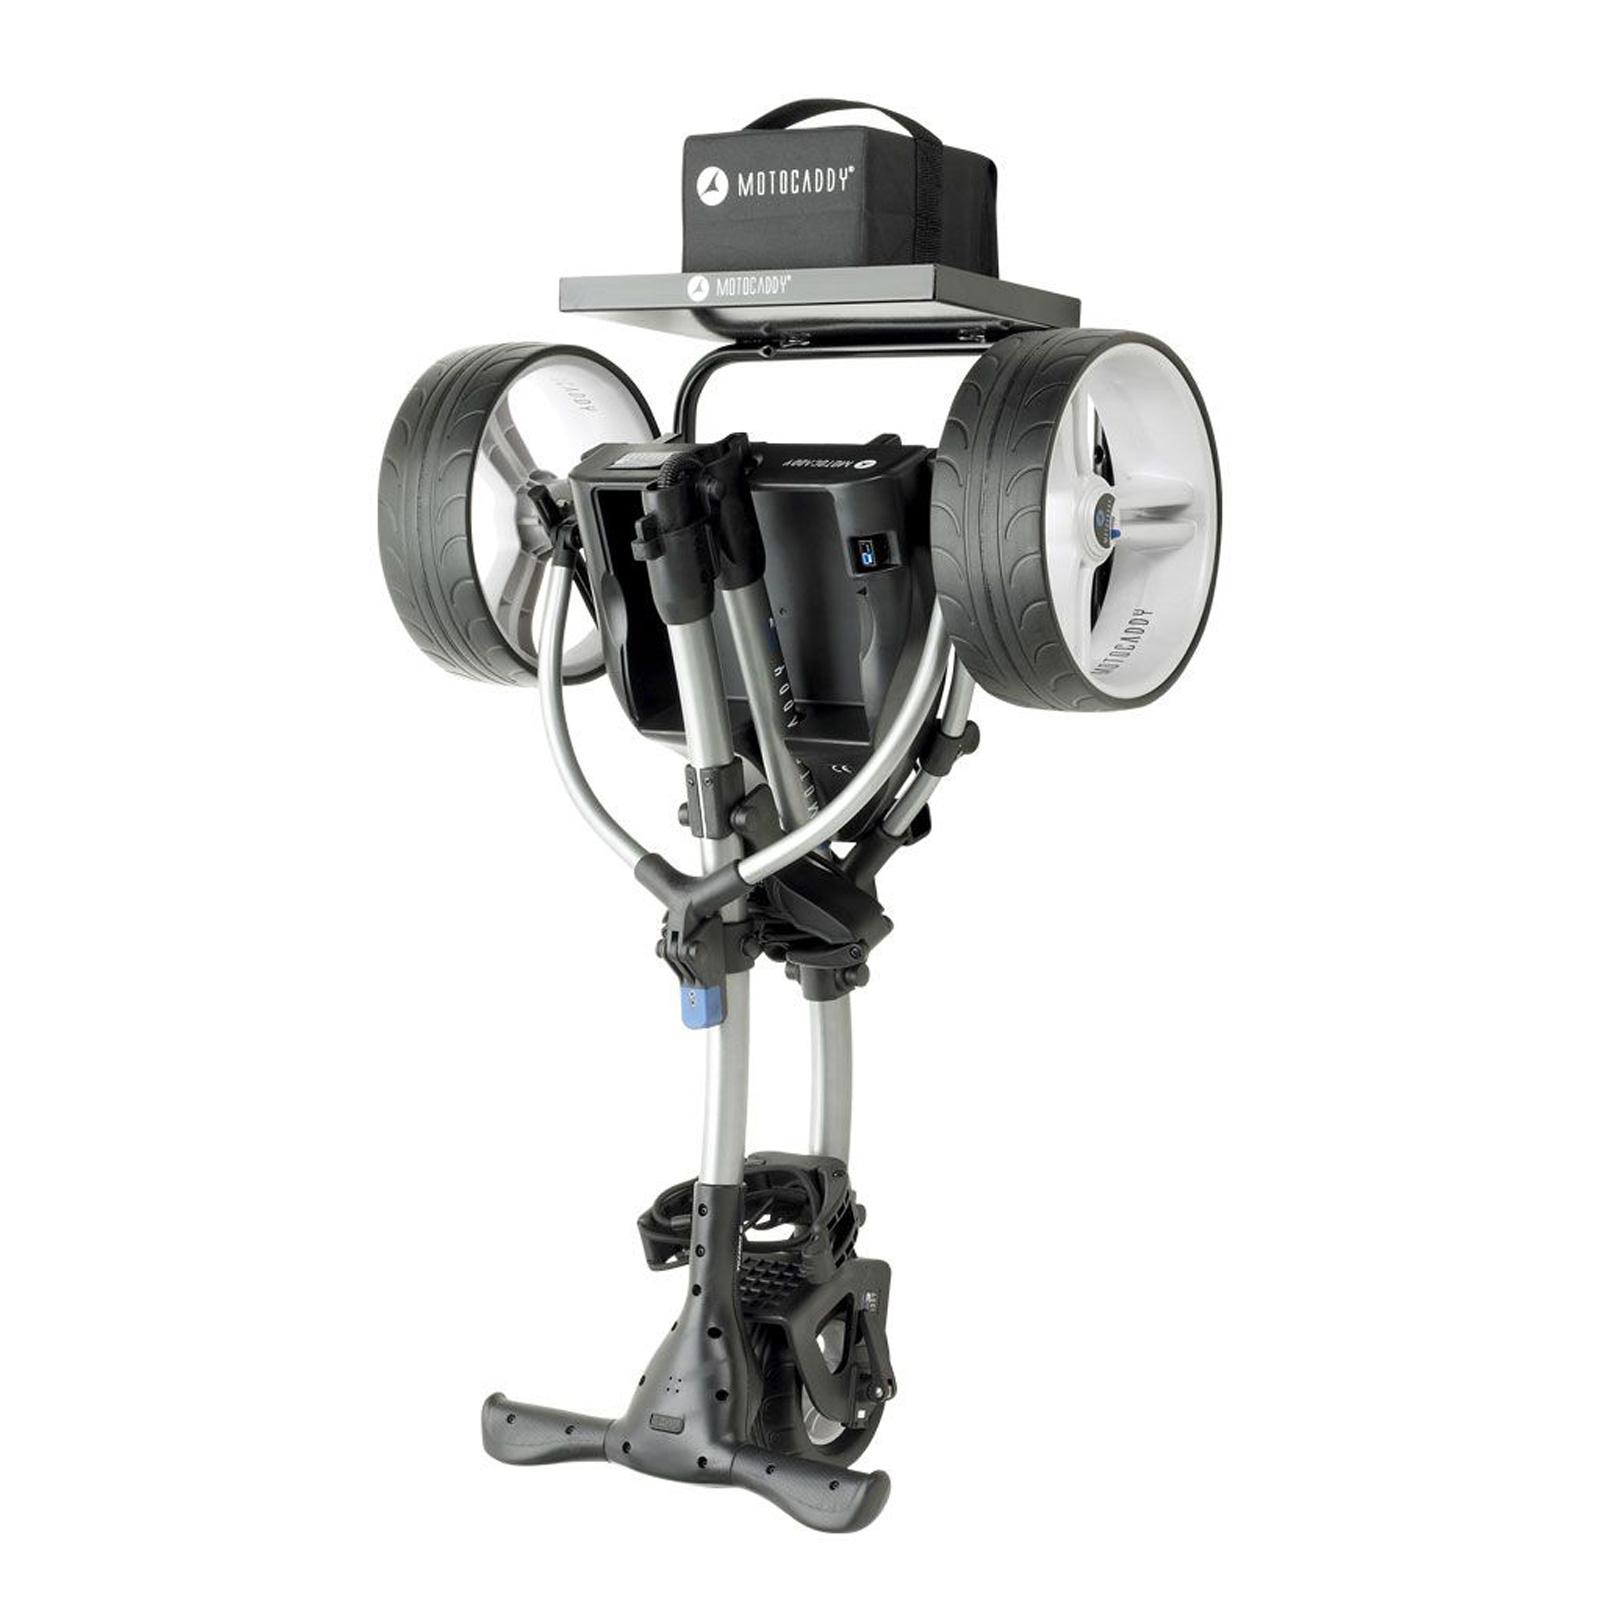 Motocaddy-Golf-Trolley-Accessories-Electric-Push-Pull-Cart-Genuine-Add-Ons miniatuur 12